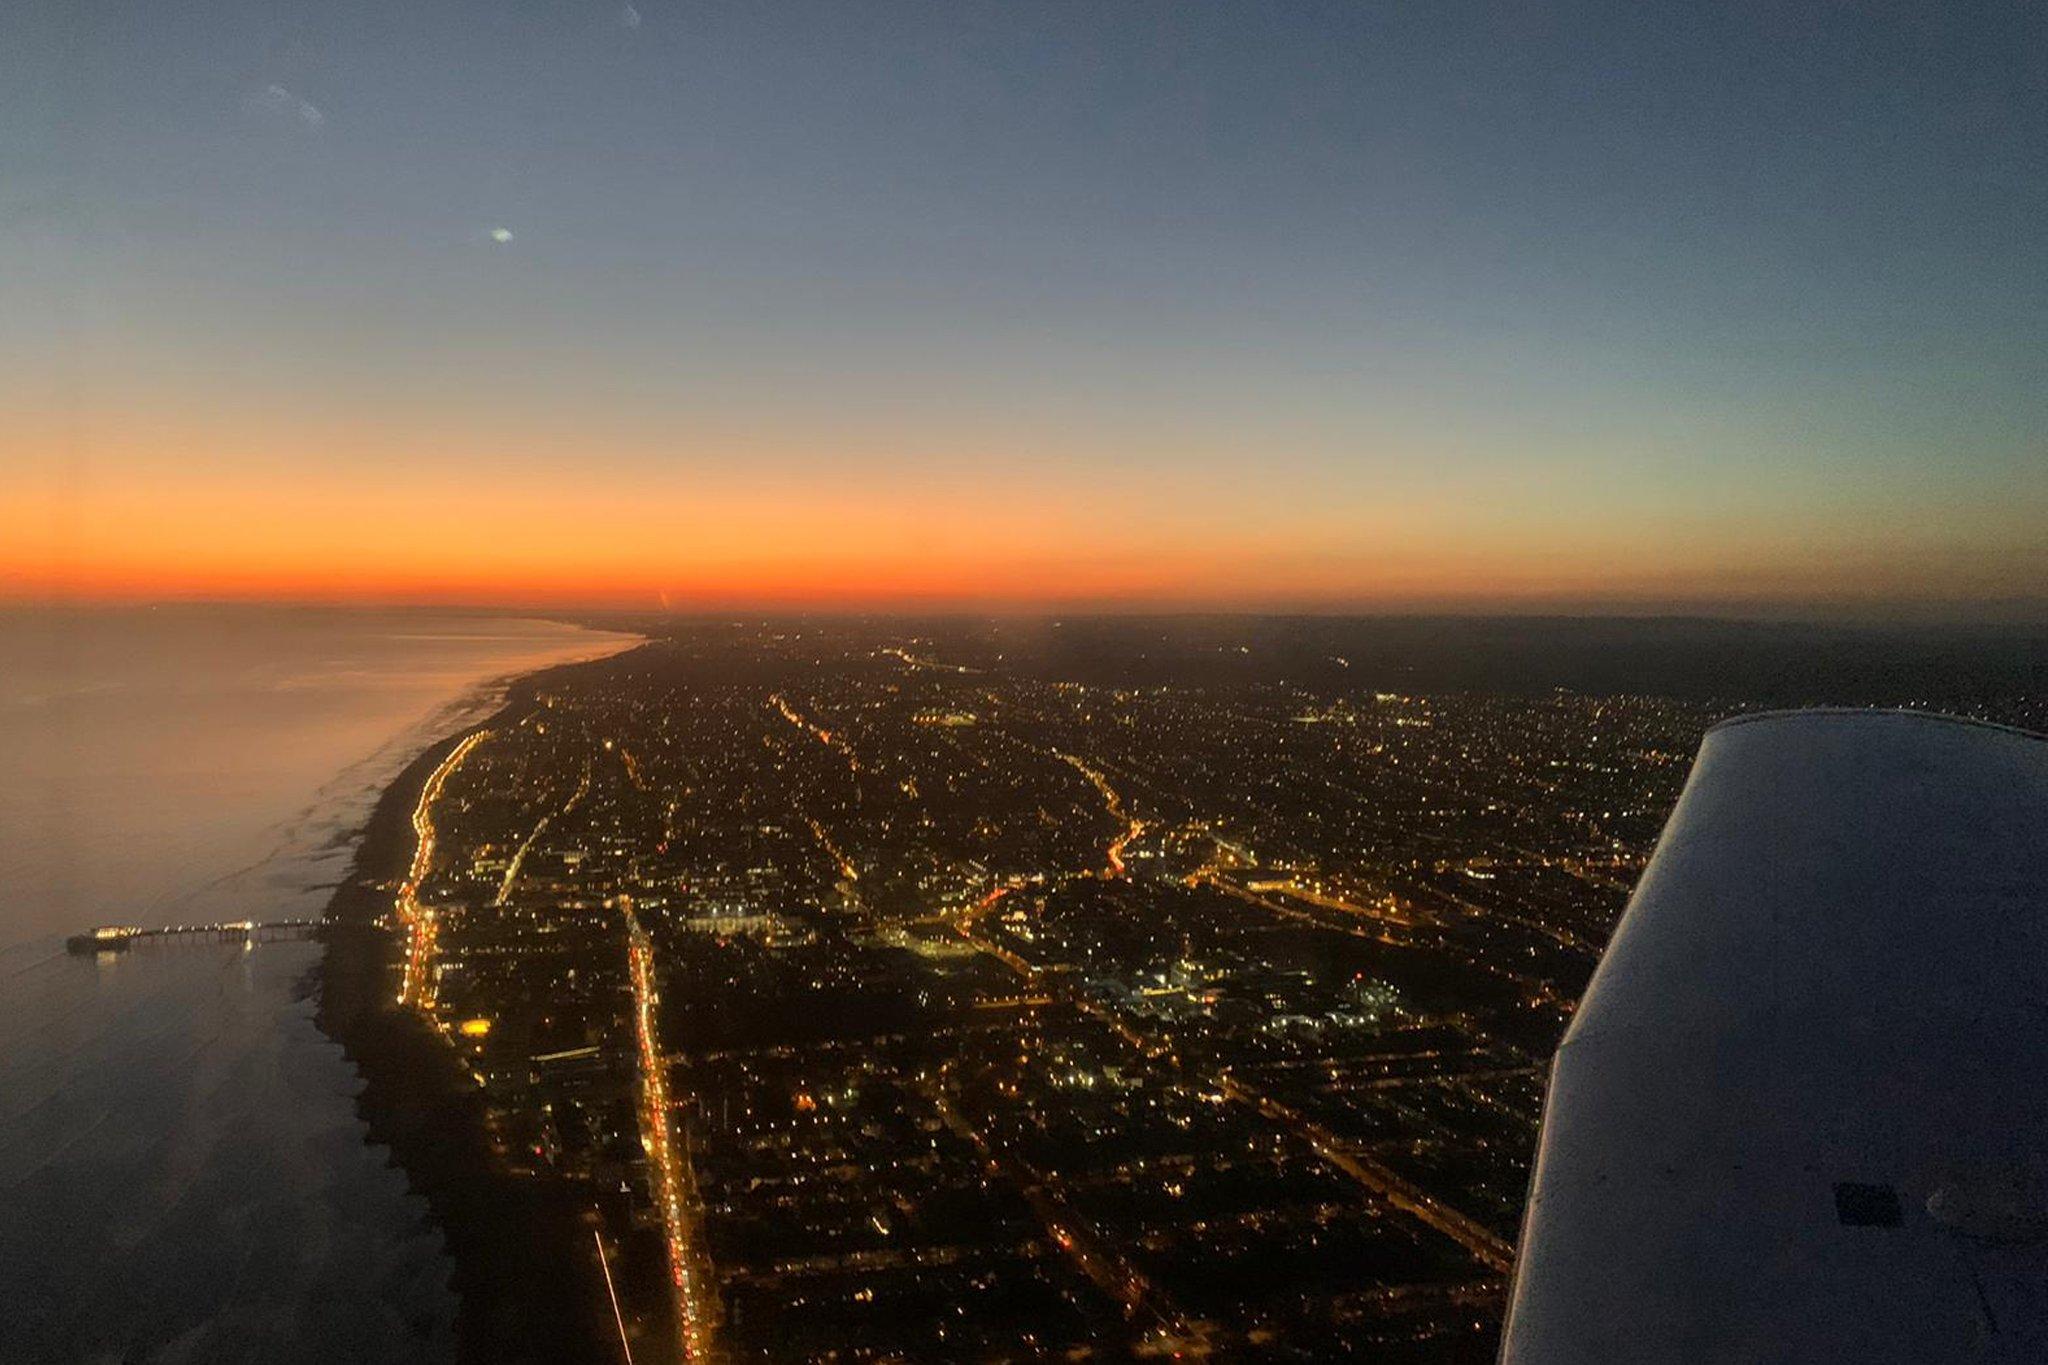 Sunset-Night-Flying-Tom-FTA